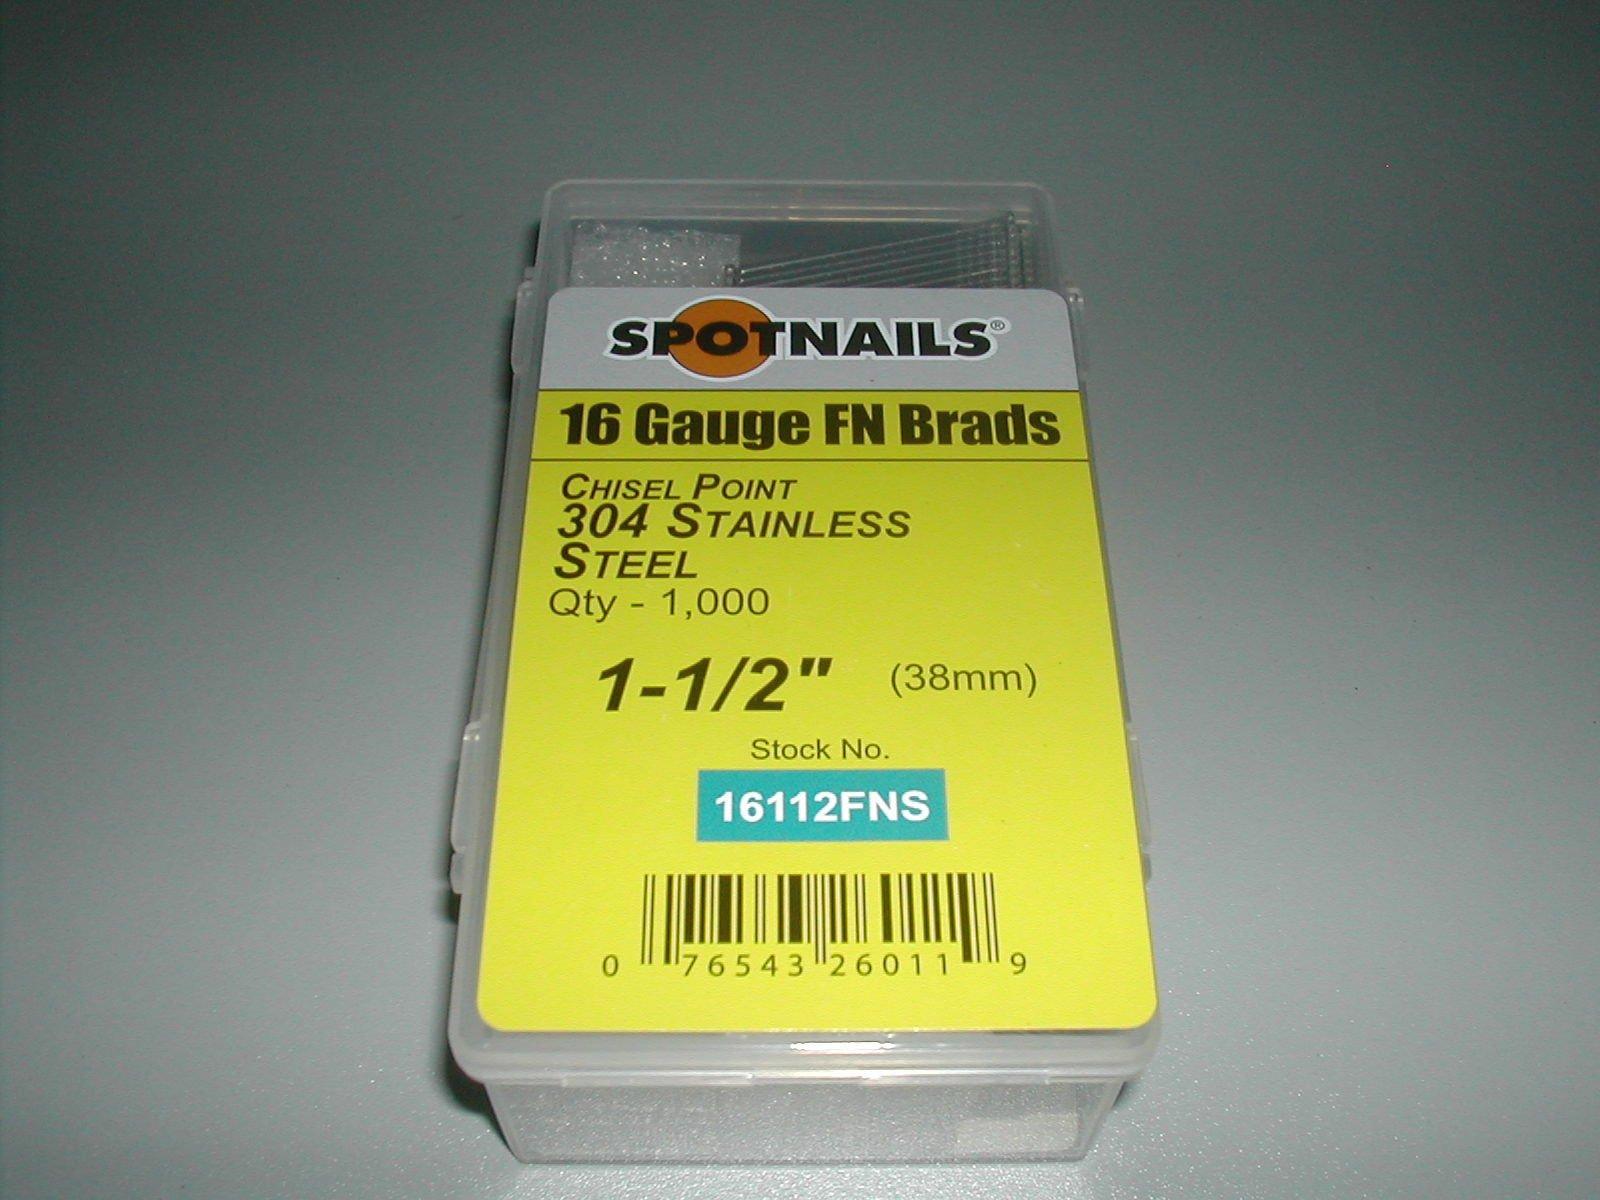 "NailPRO 15 Gauge 2-1//2/"" Angled Finish Nail DA25 304 Stainless Steel 1,000 pcs"